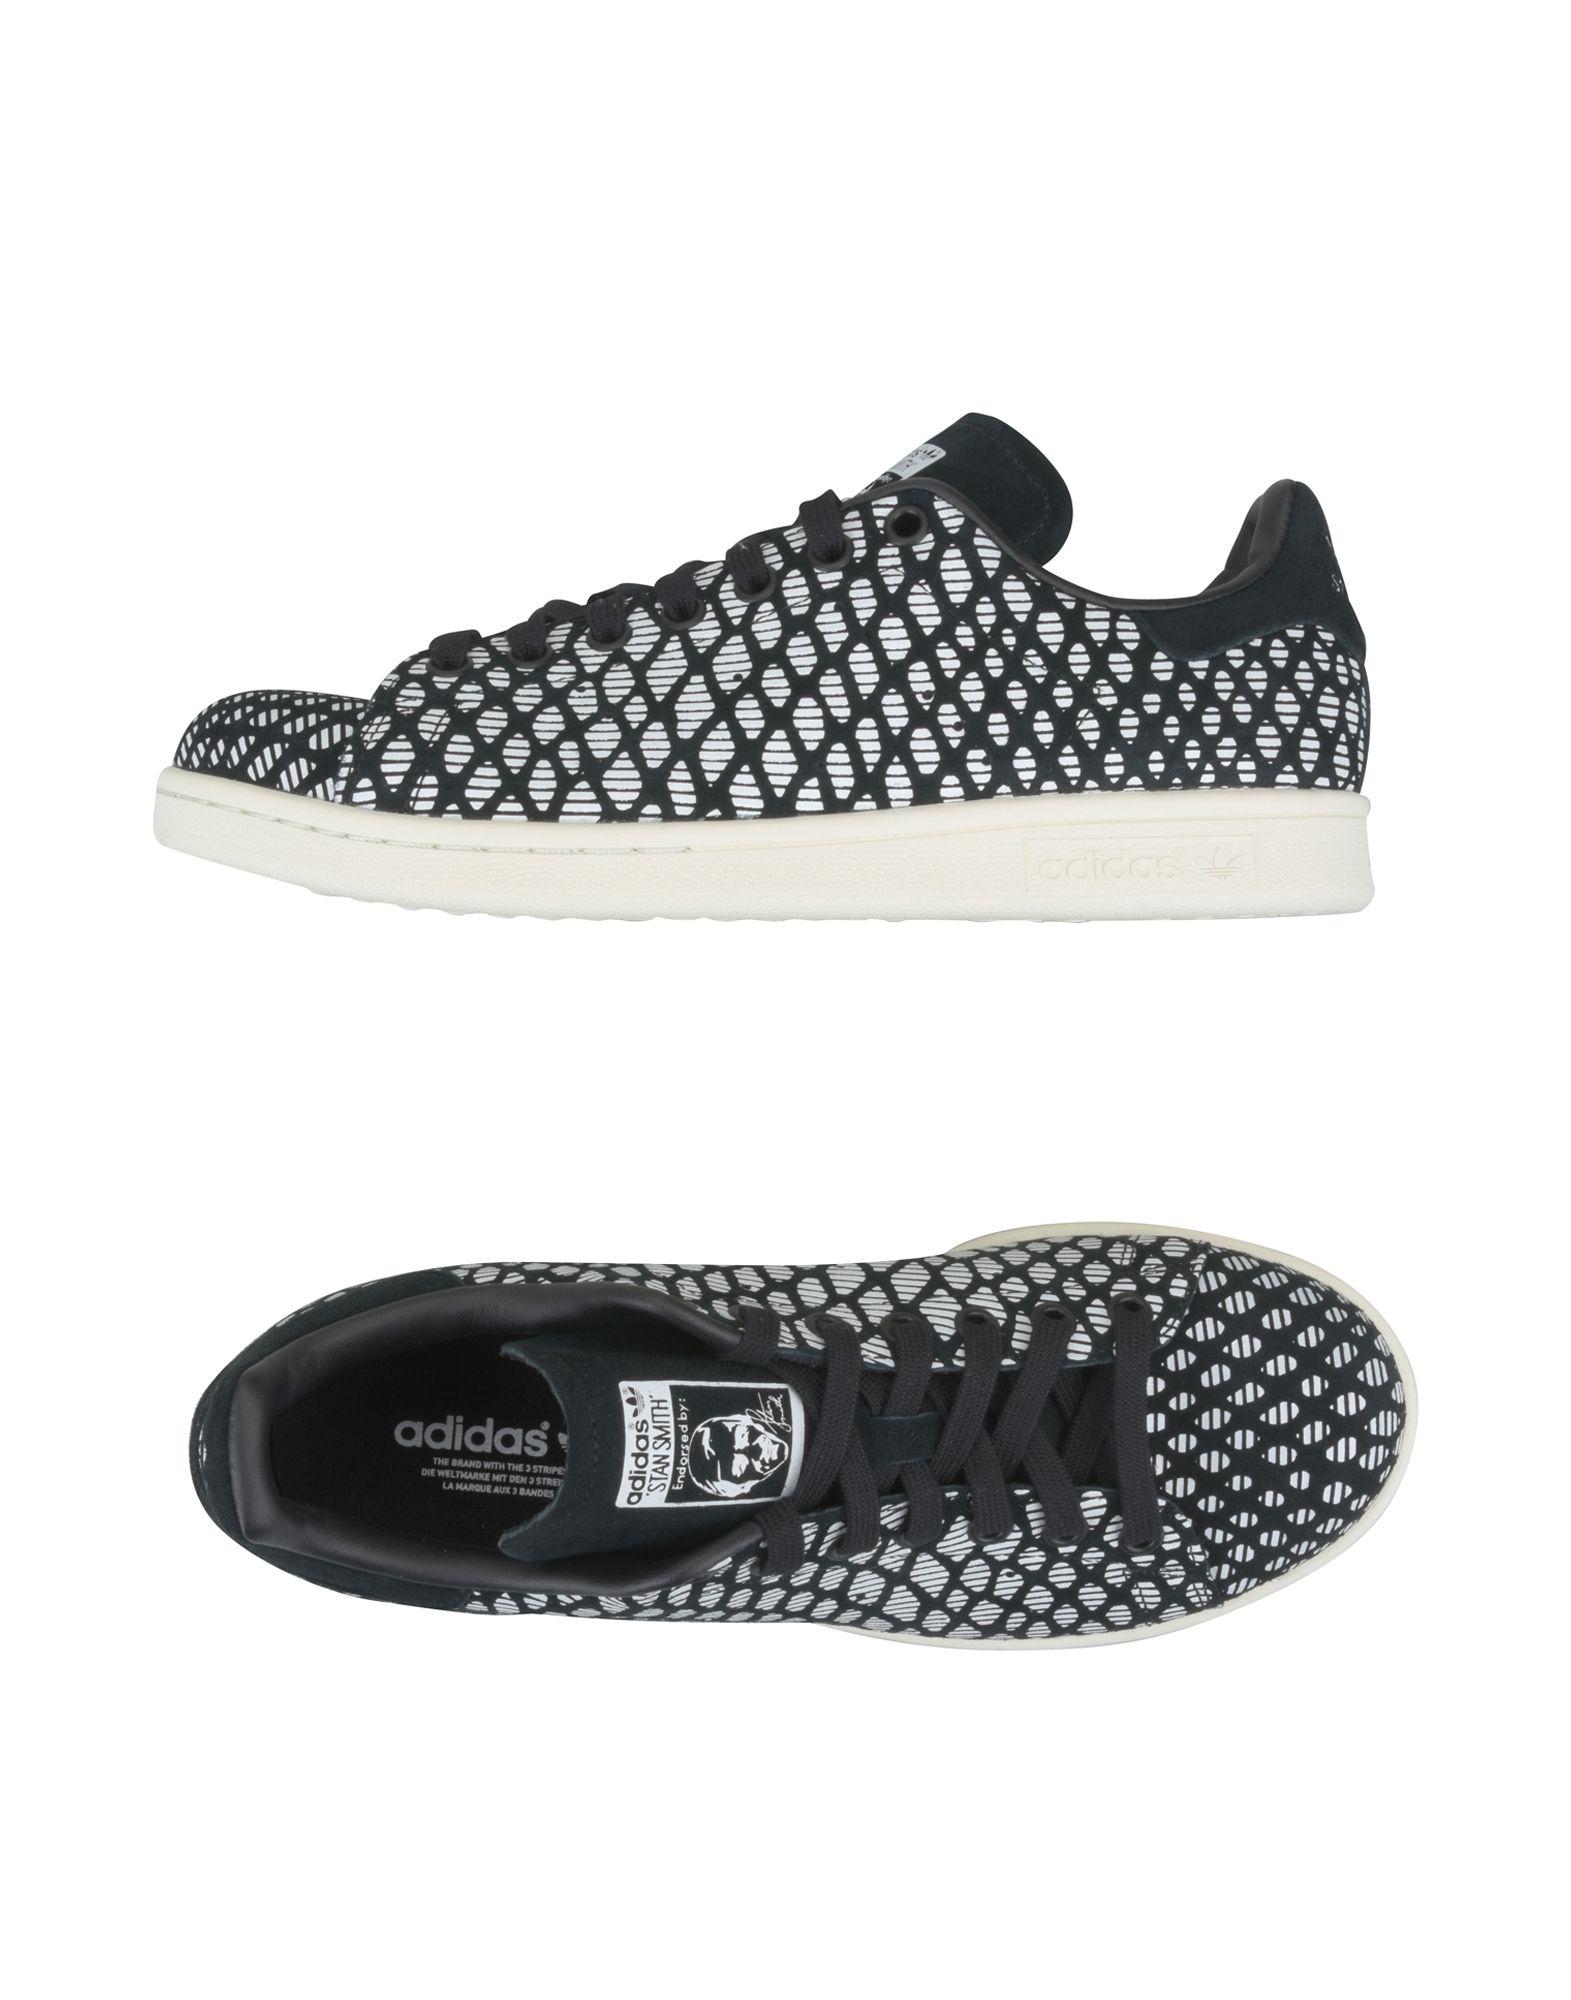 ADIDAS ORIGINALS Damen Low Sneakers & Tennisschuhe Farbe Schwarz Größe 9 jetztbilligerkaufen